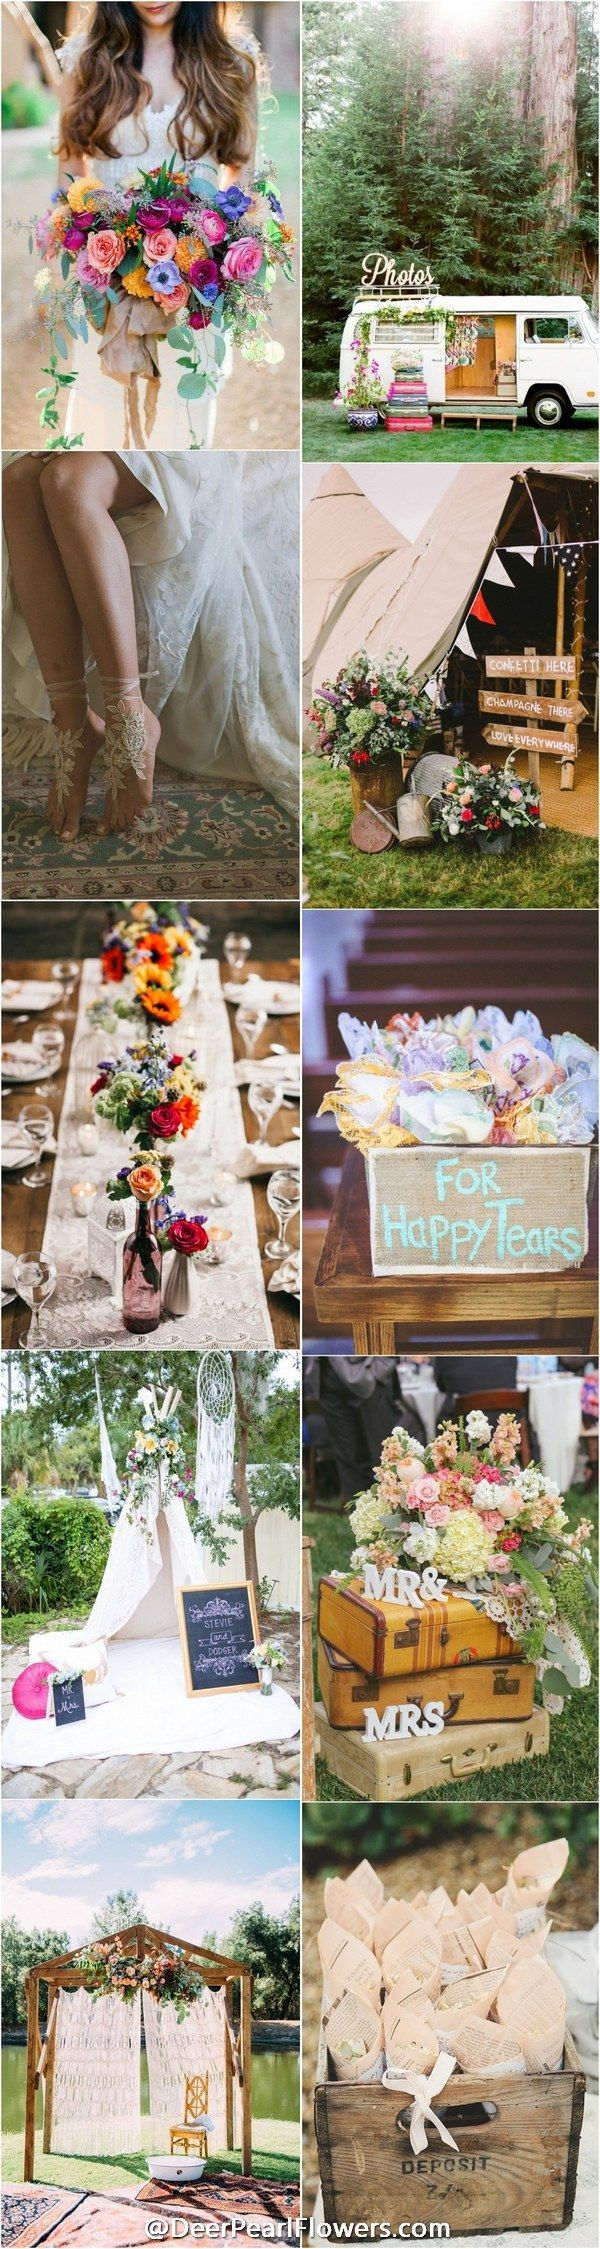 Best 25 bohemian wedding theme ideas on pinterest boho wedding 20 splendid vintage bohemian wedding ideas junglespirit Choice Image